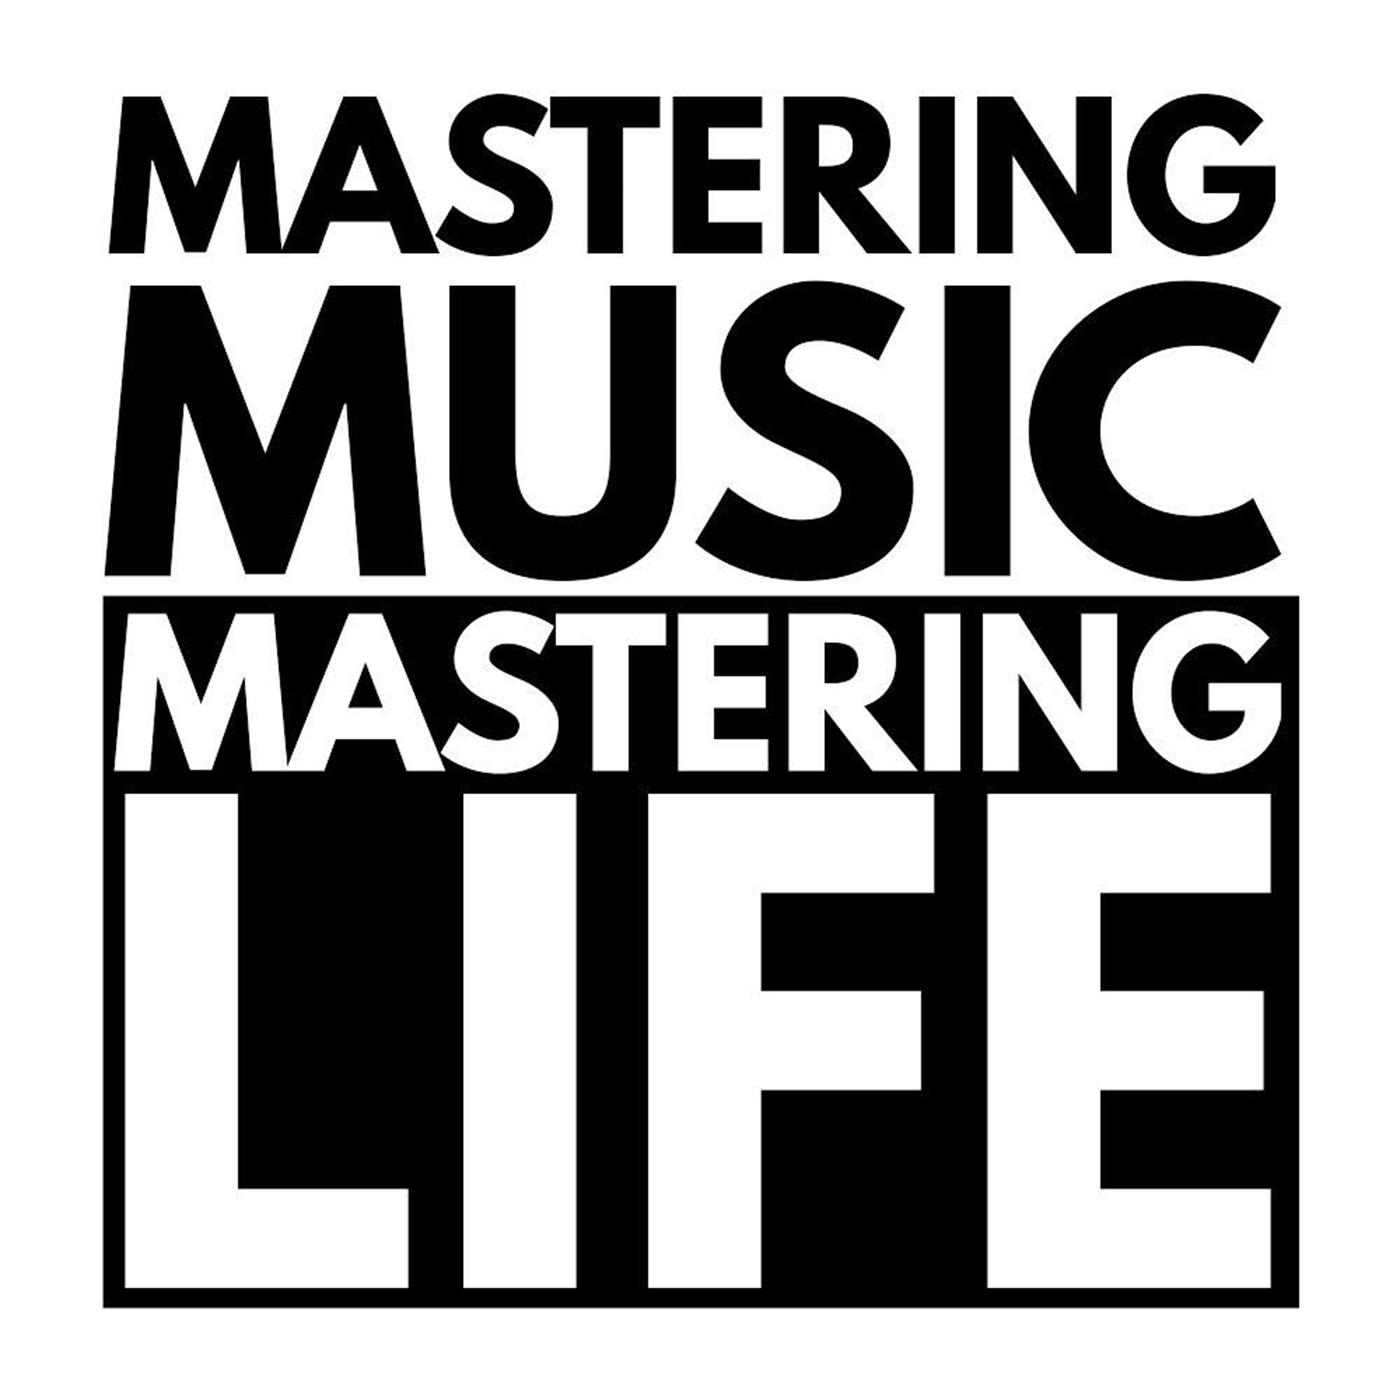 Mastering Music Mastering Life